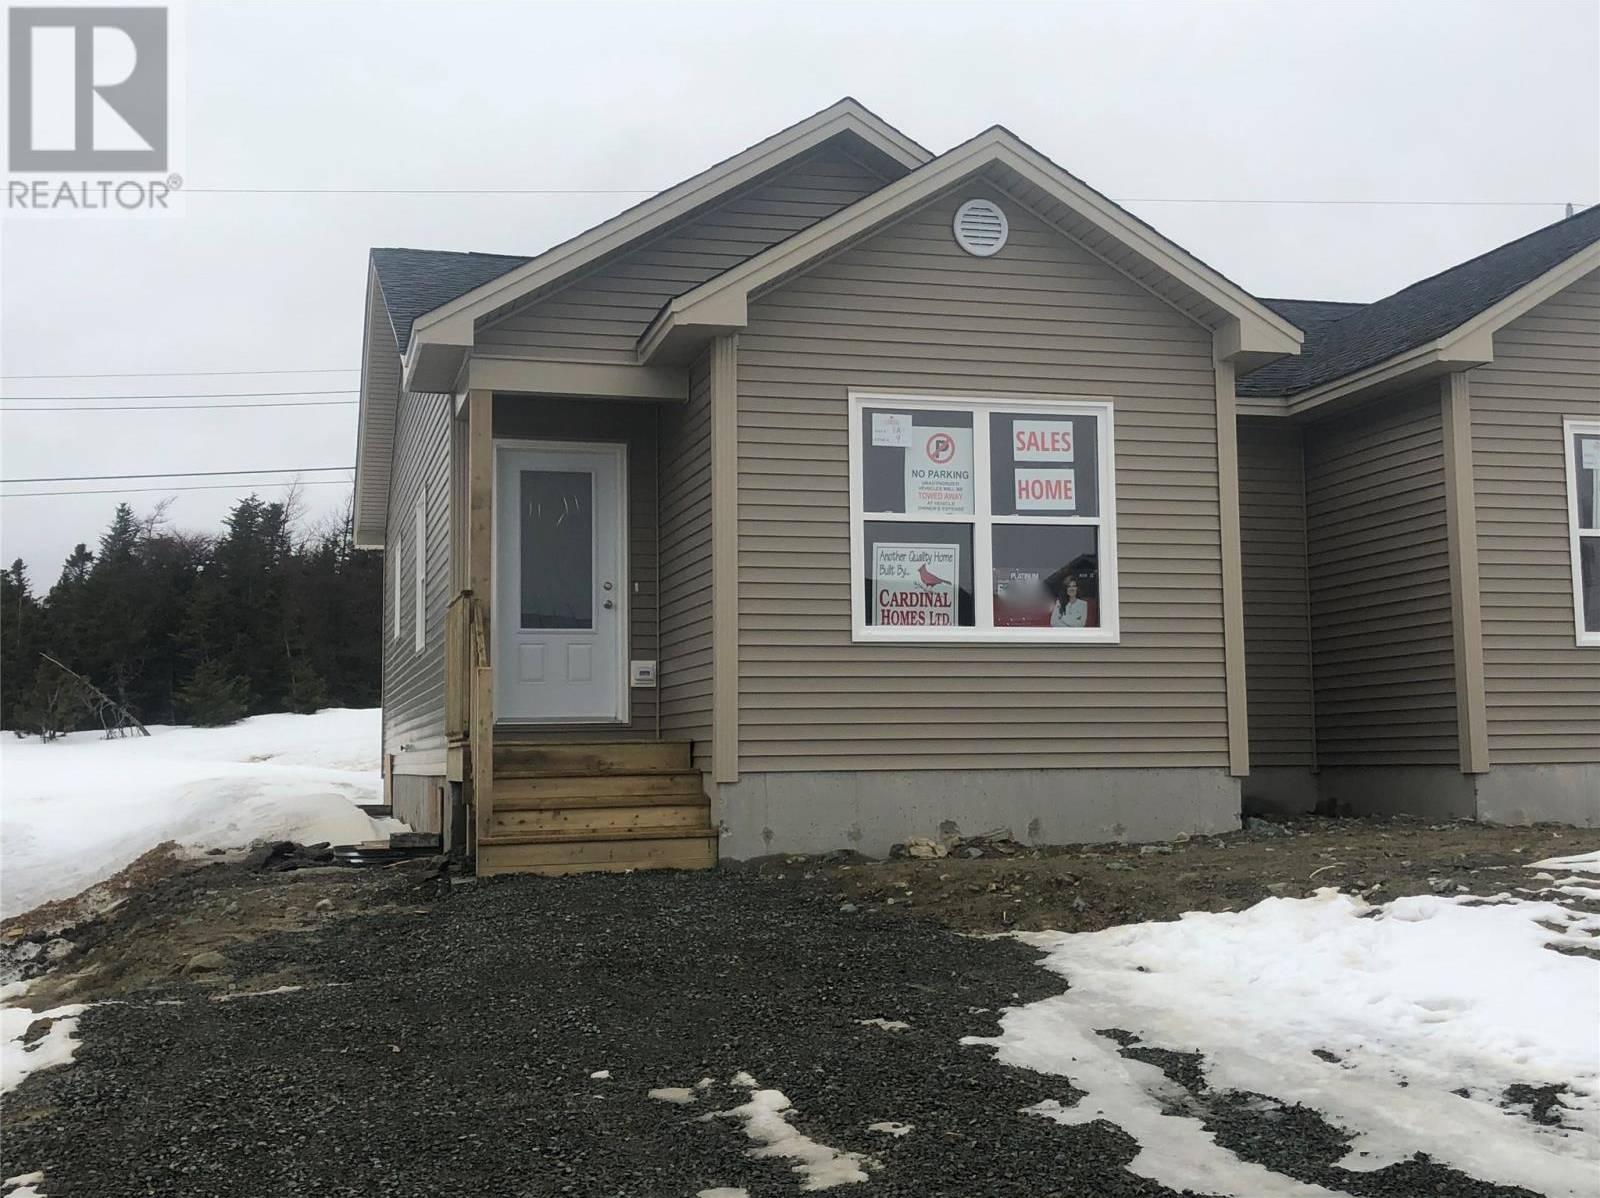 House for sale at 9 Larsen St Mount Pearl Newfoundland - MLS: 1207413